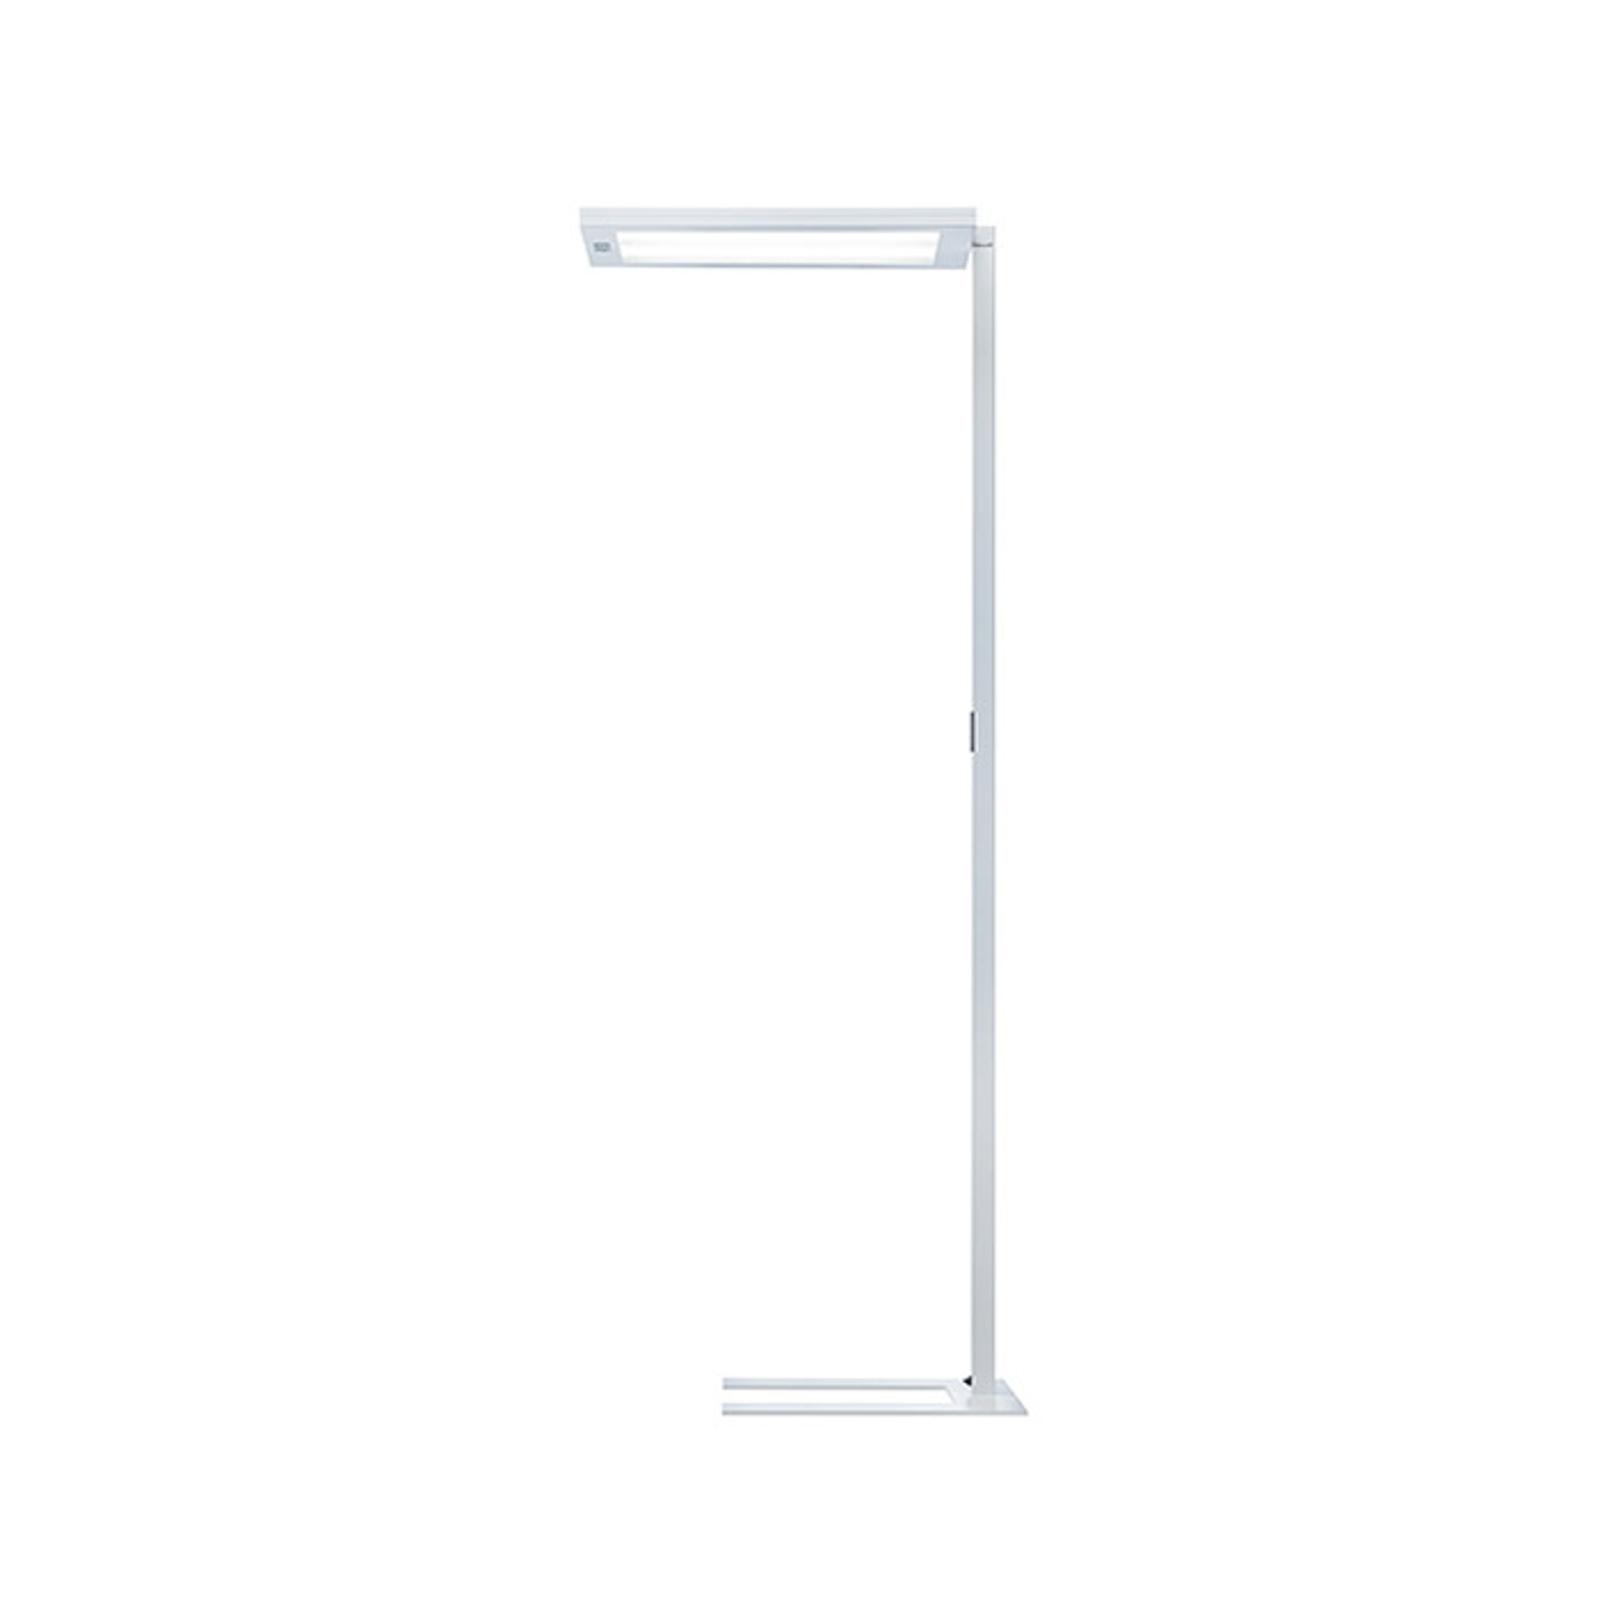 LED-Stehlampe Lavigo DPS 14000/840/R/G2 102W